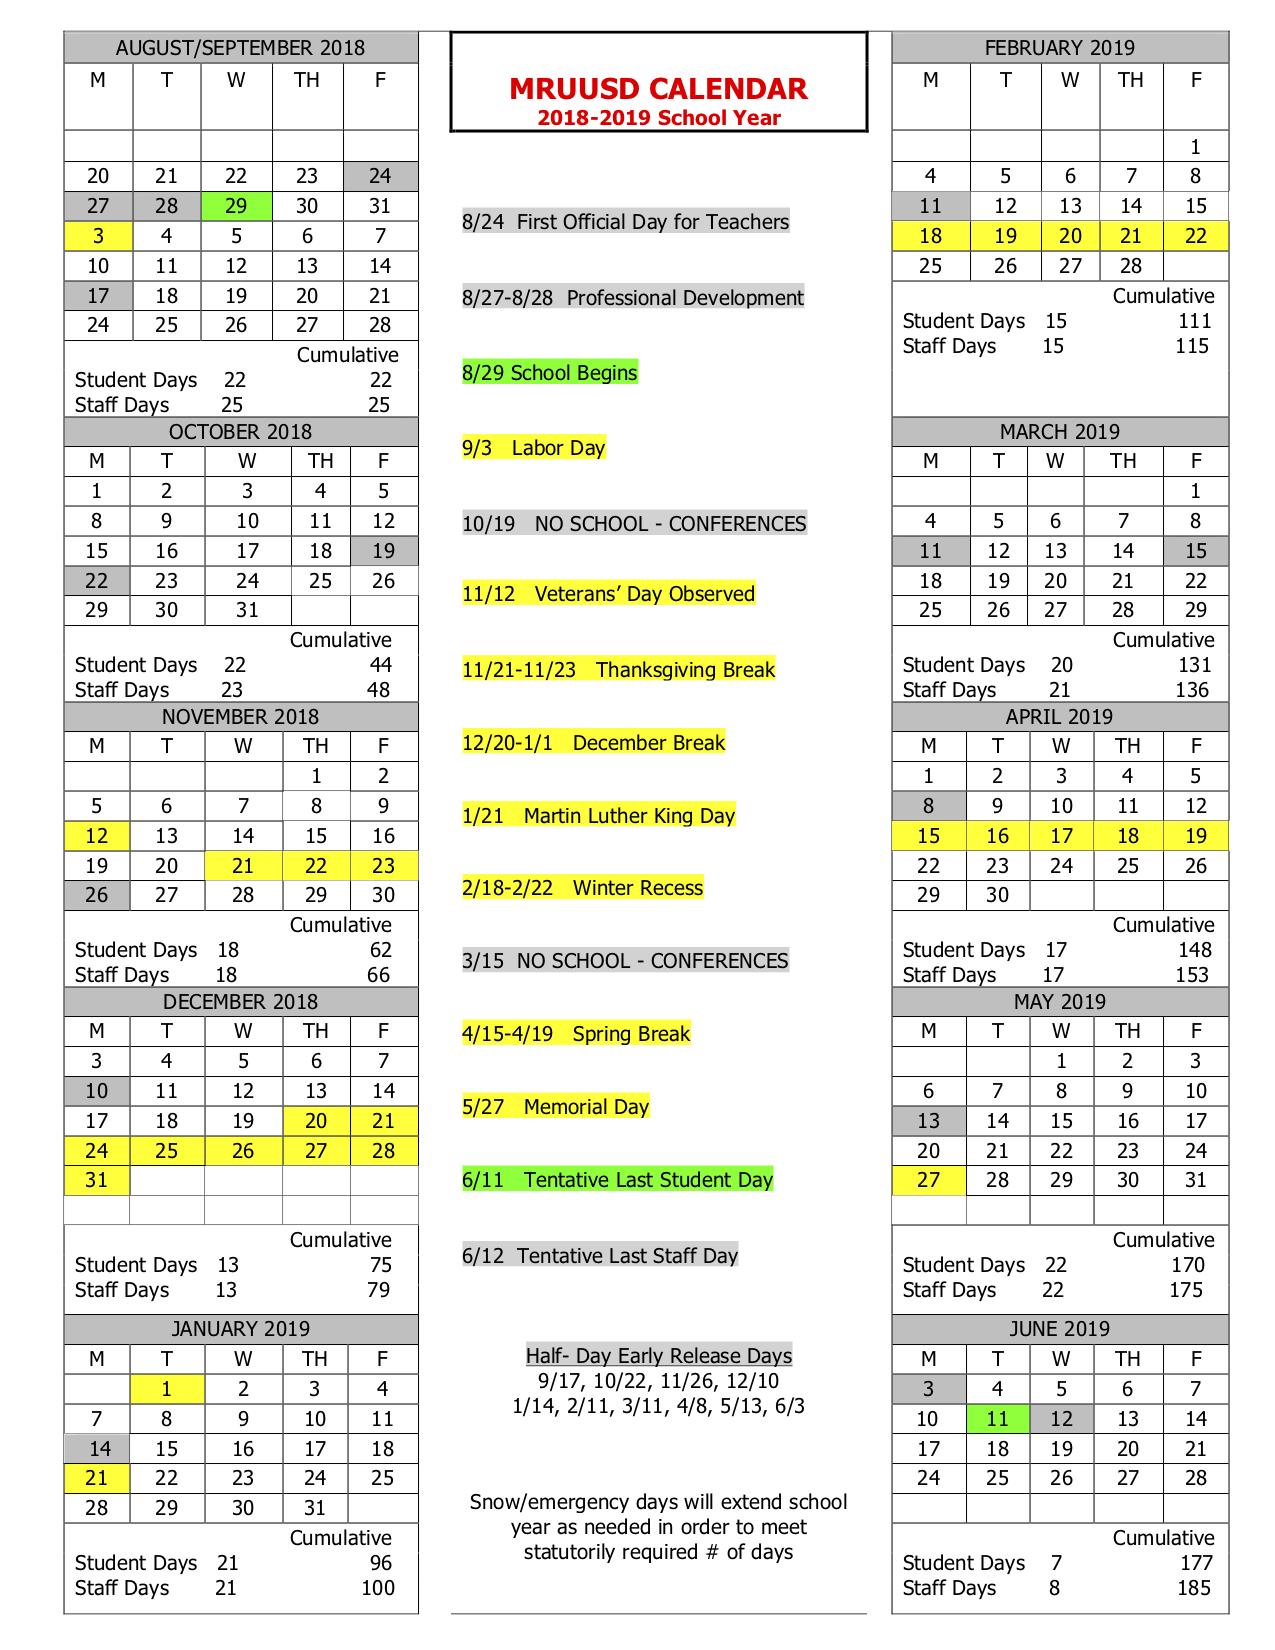 MRUUSD-1718-School-Year-Calendar